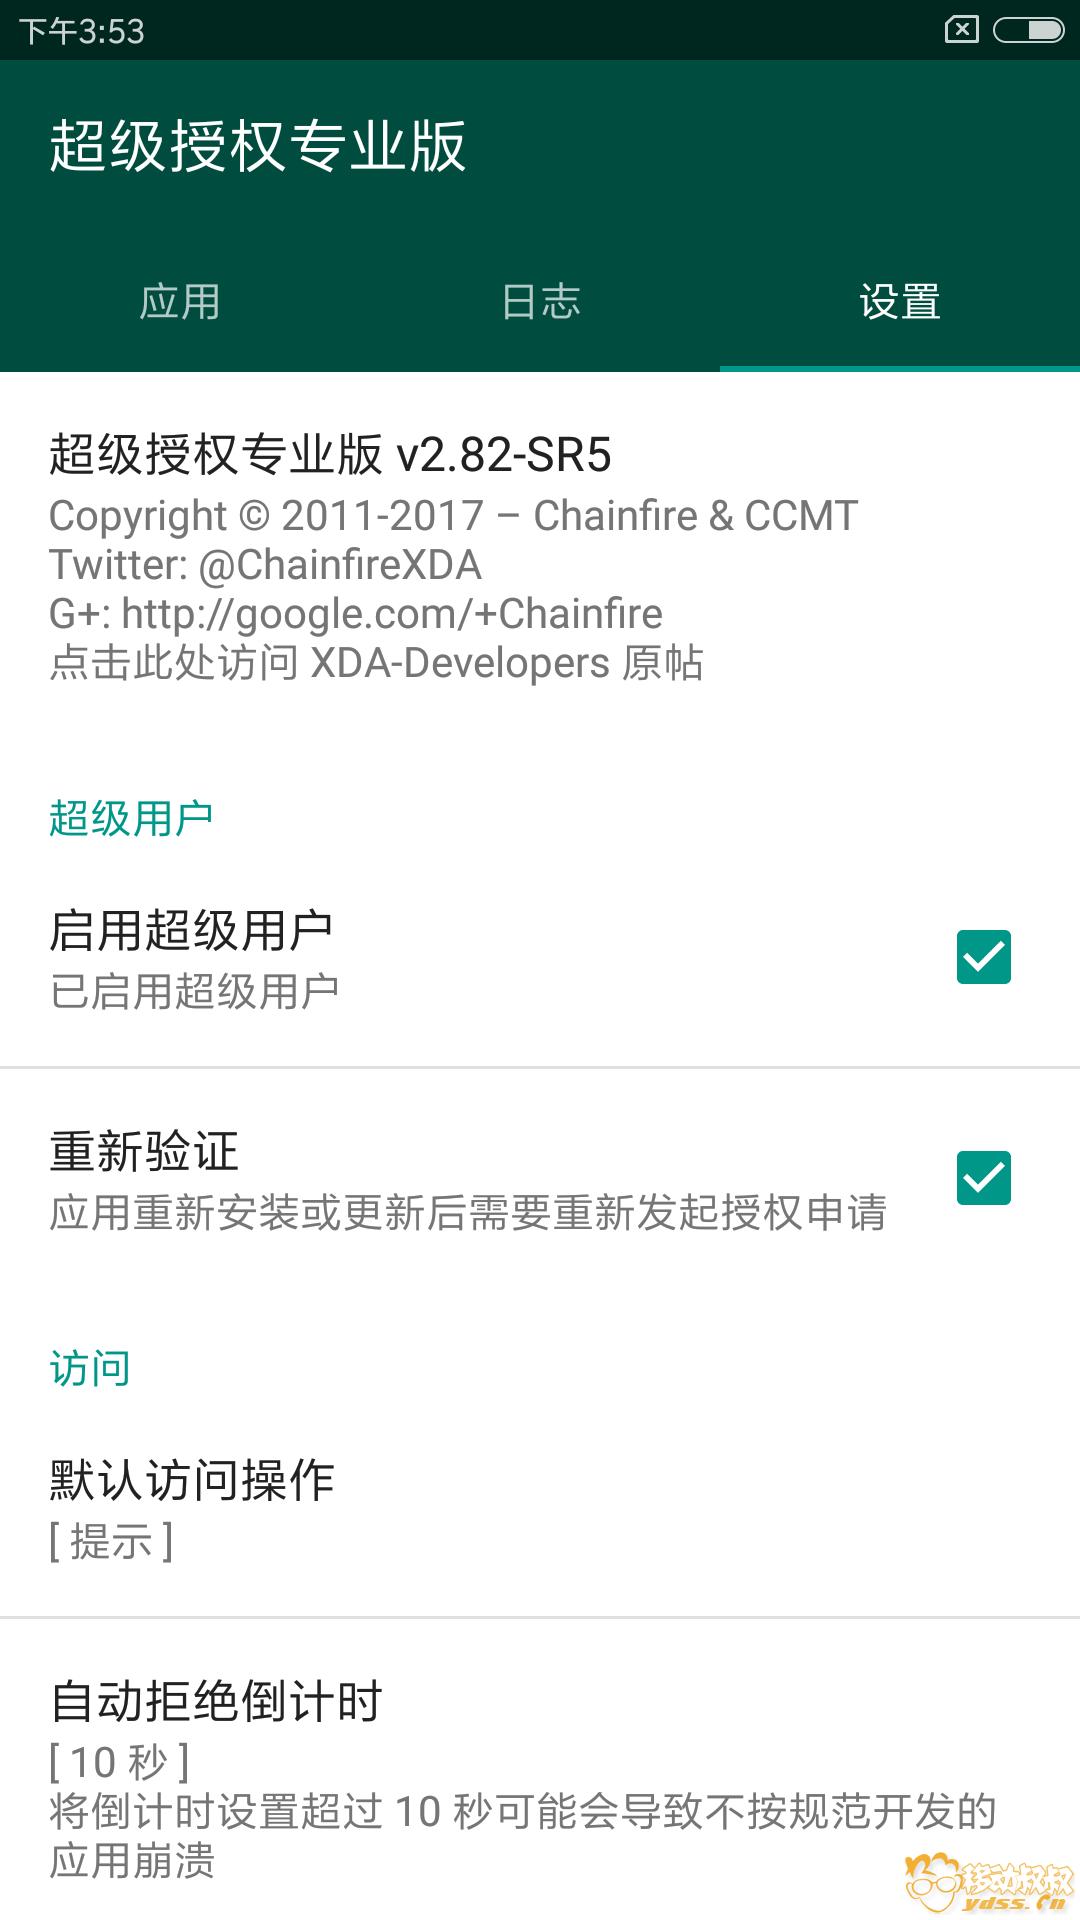 Screenshot_2018-03-08-15-53-56-335_eu.chainfire.supersu.png